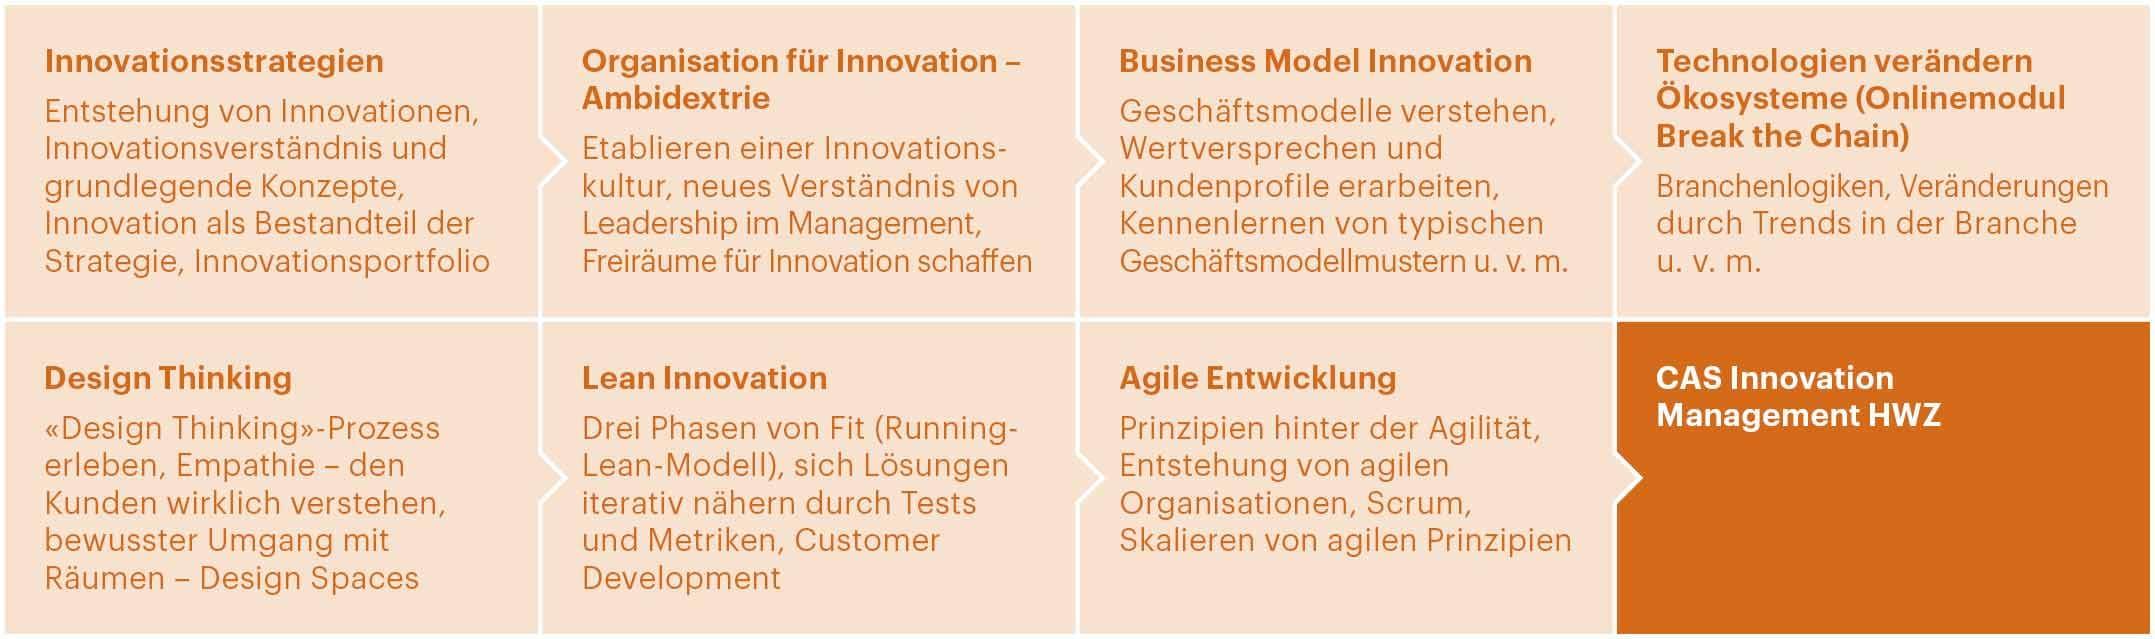 Grafik Business Model Innovation - CAS Innovation Management - HWZ